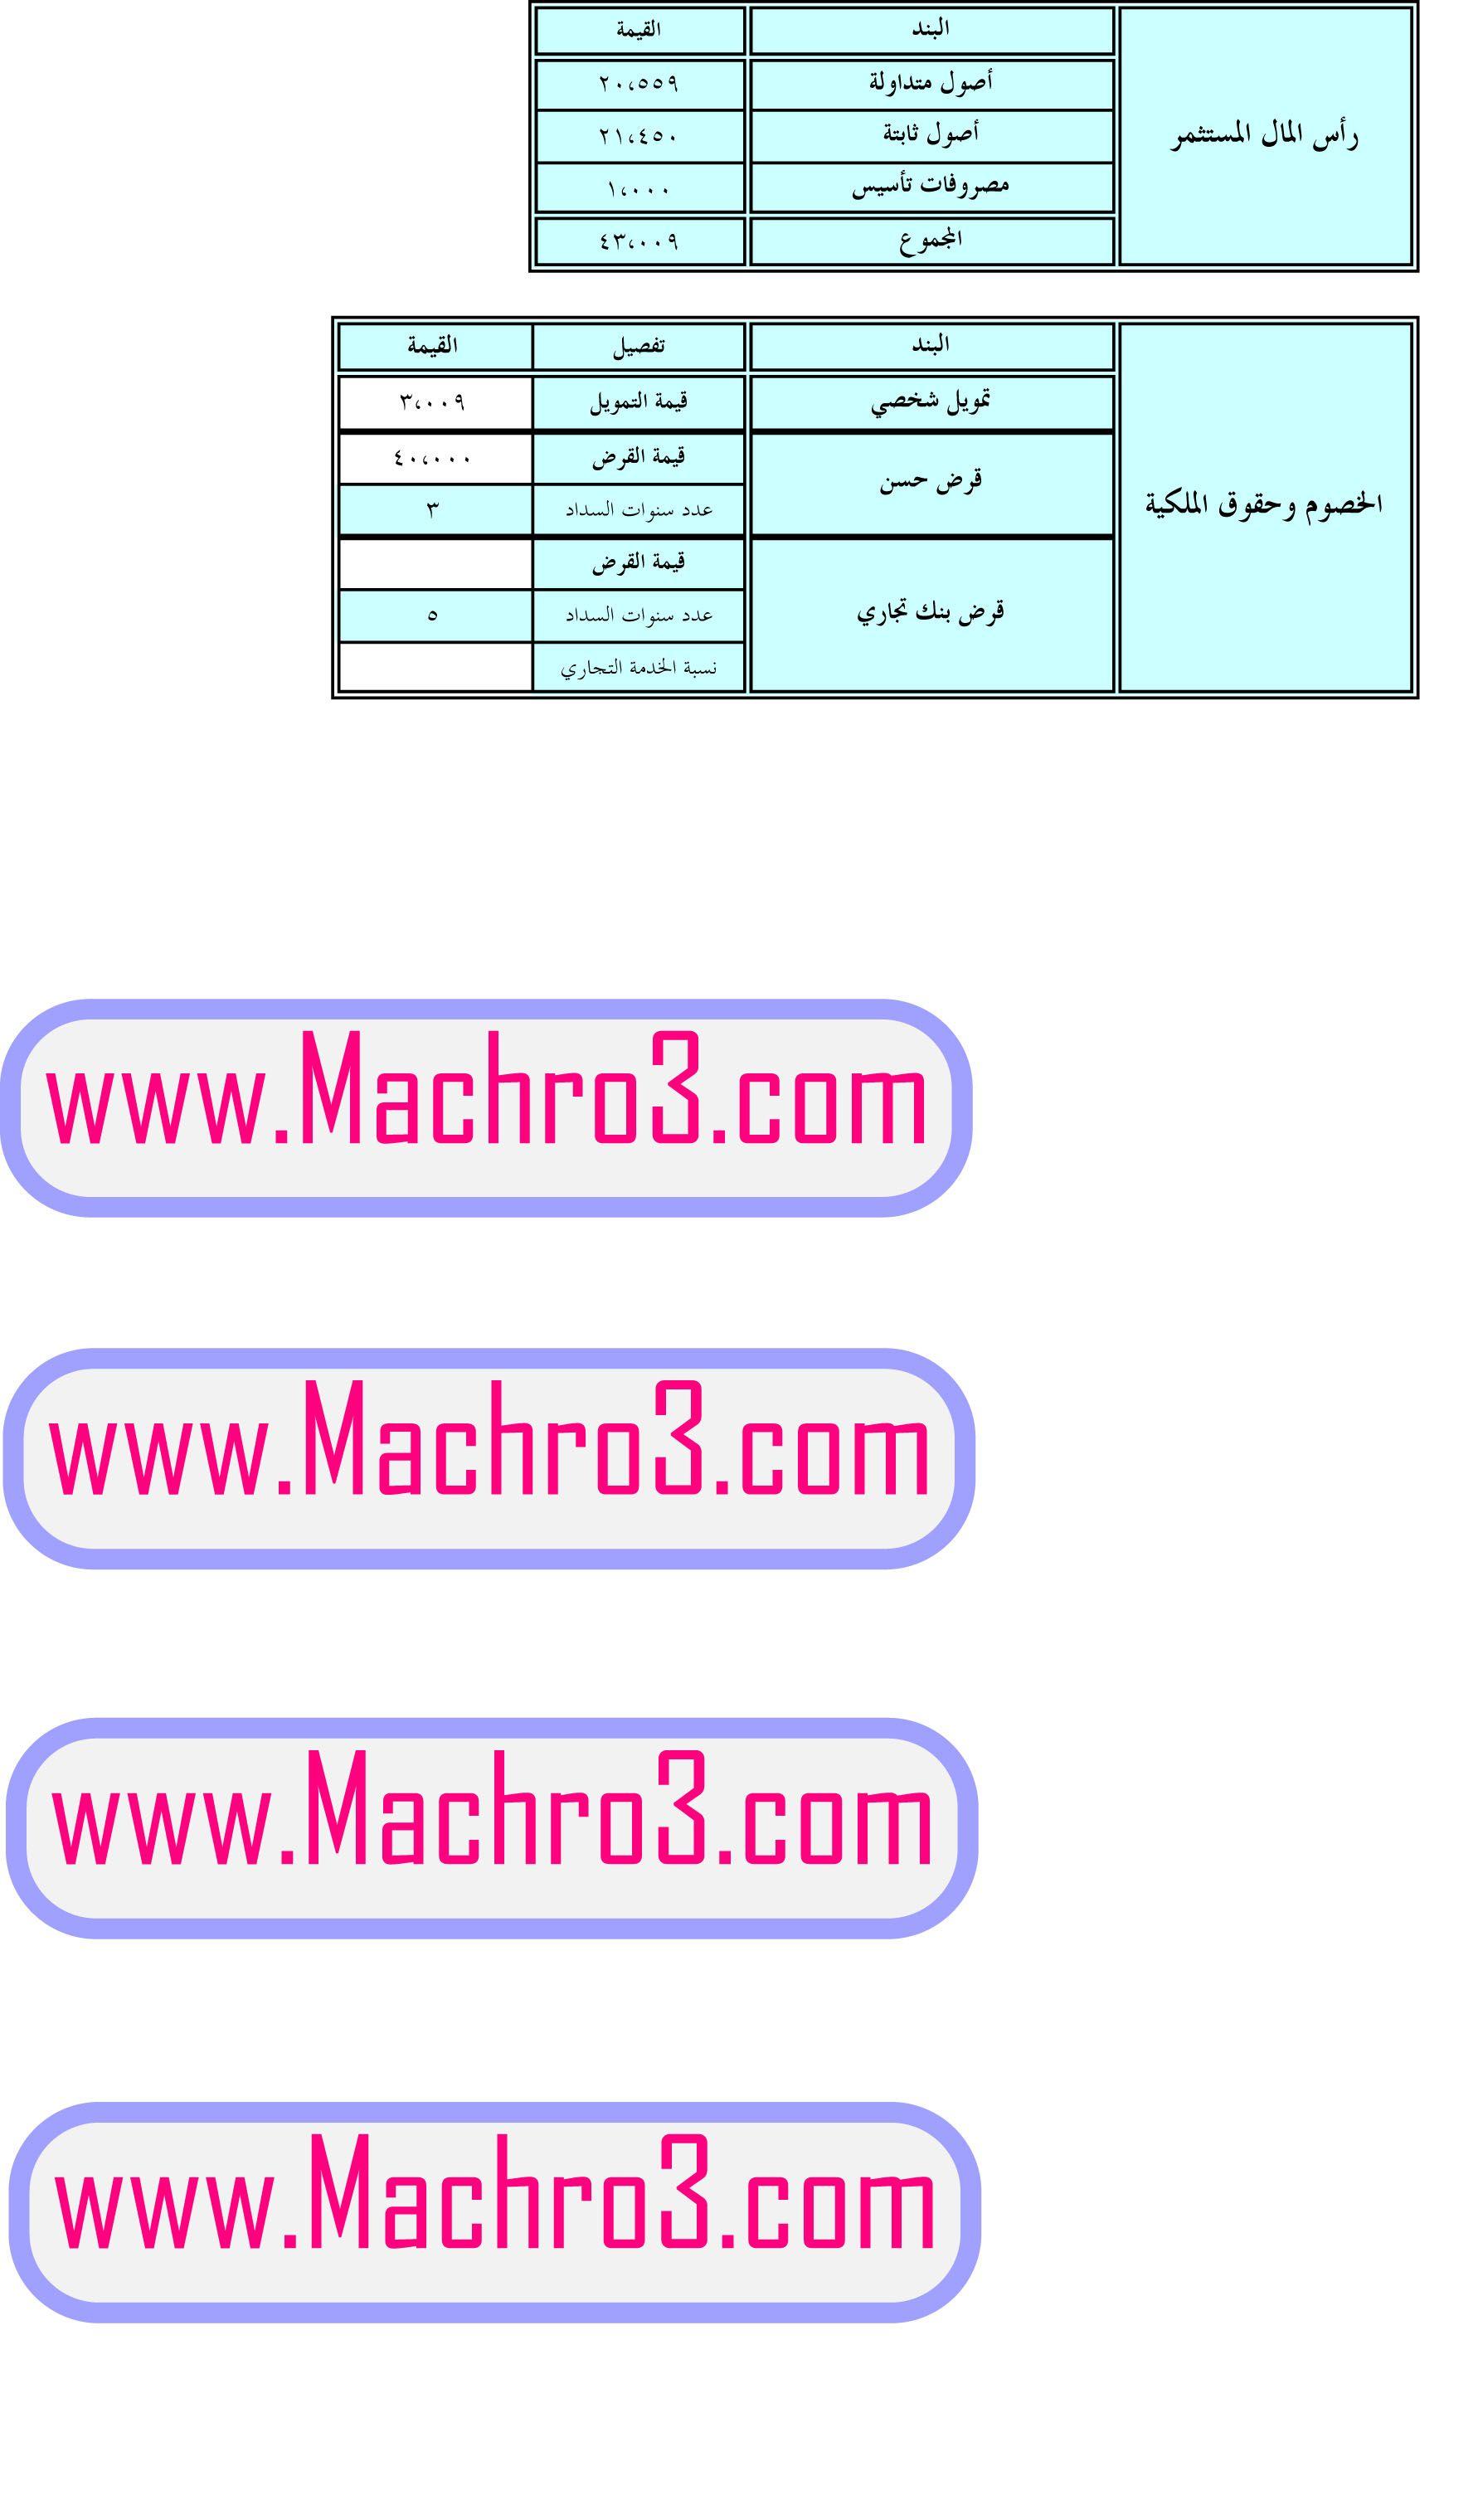 Pin By موقع مشروع Mchro3 Com On دراسة جدوى جاهزة مجانا لفكرة مشروع صيانة المكيفات Bar Chart Chart Diagram